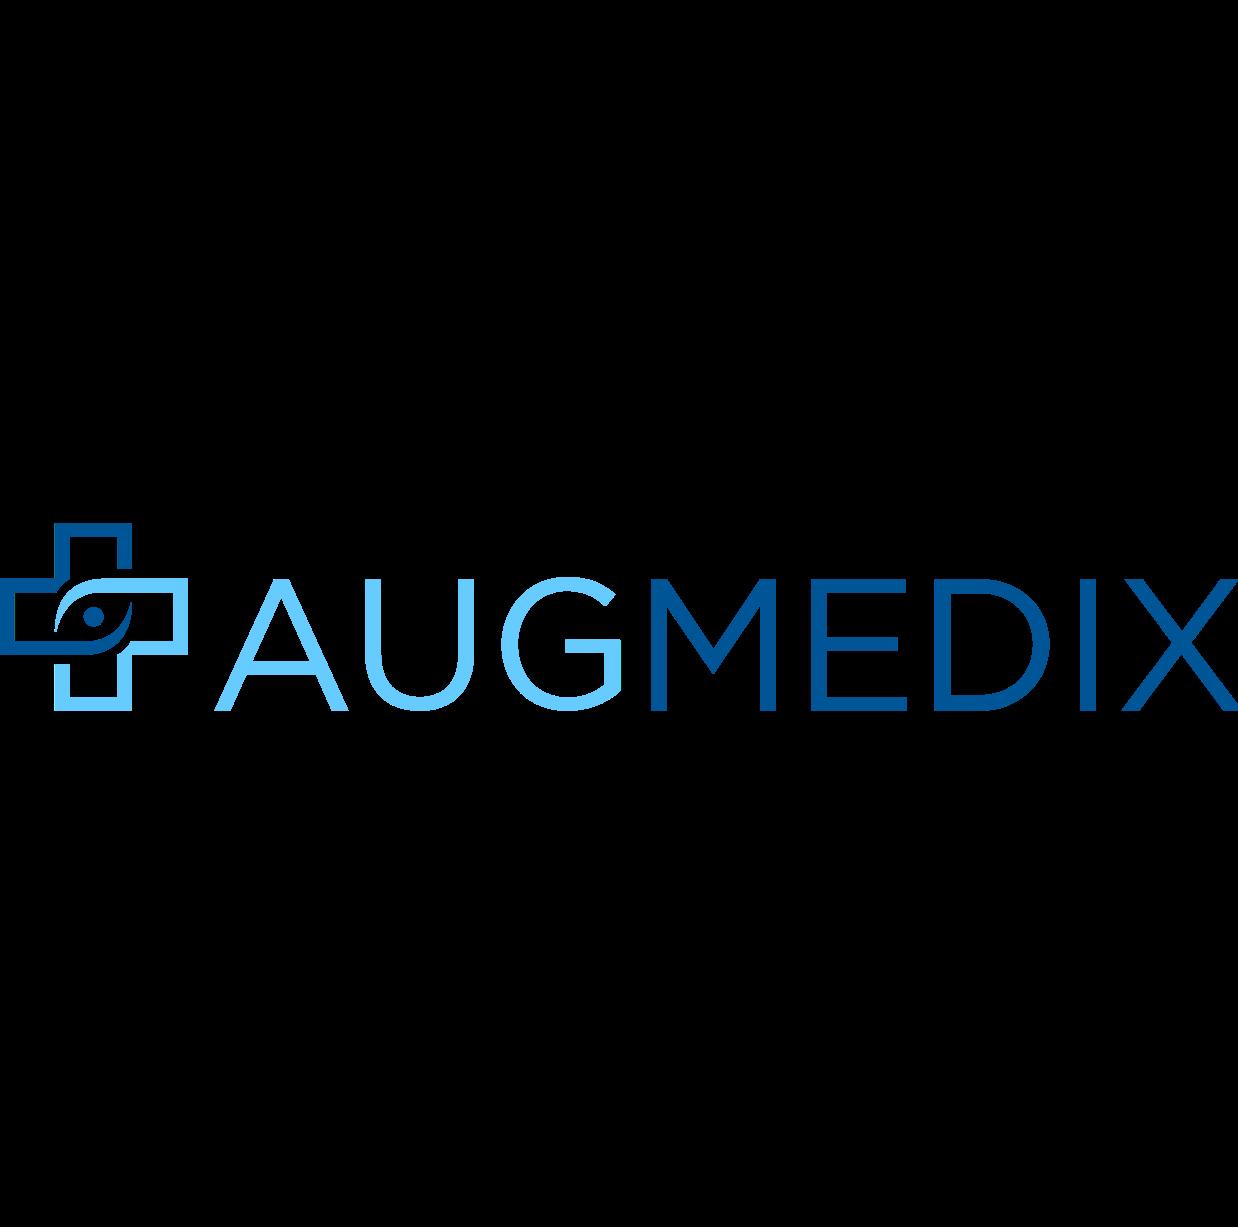 https://assets.roar.media/assets/Ty3qo3g1PEPsG0Ou_Augmedix-logo.png